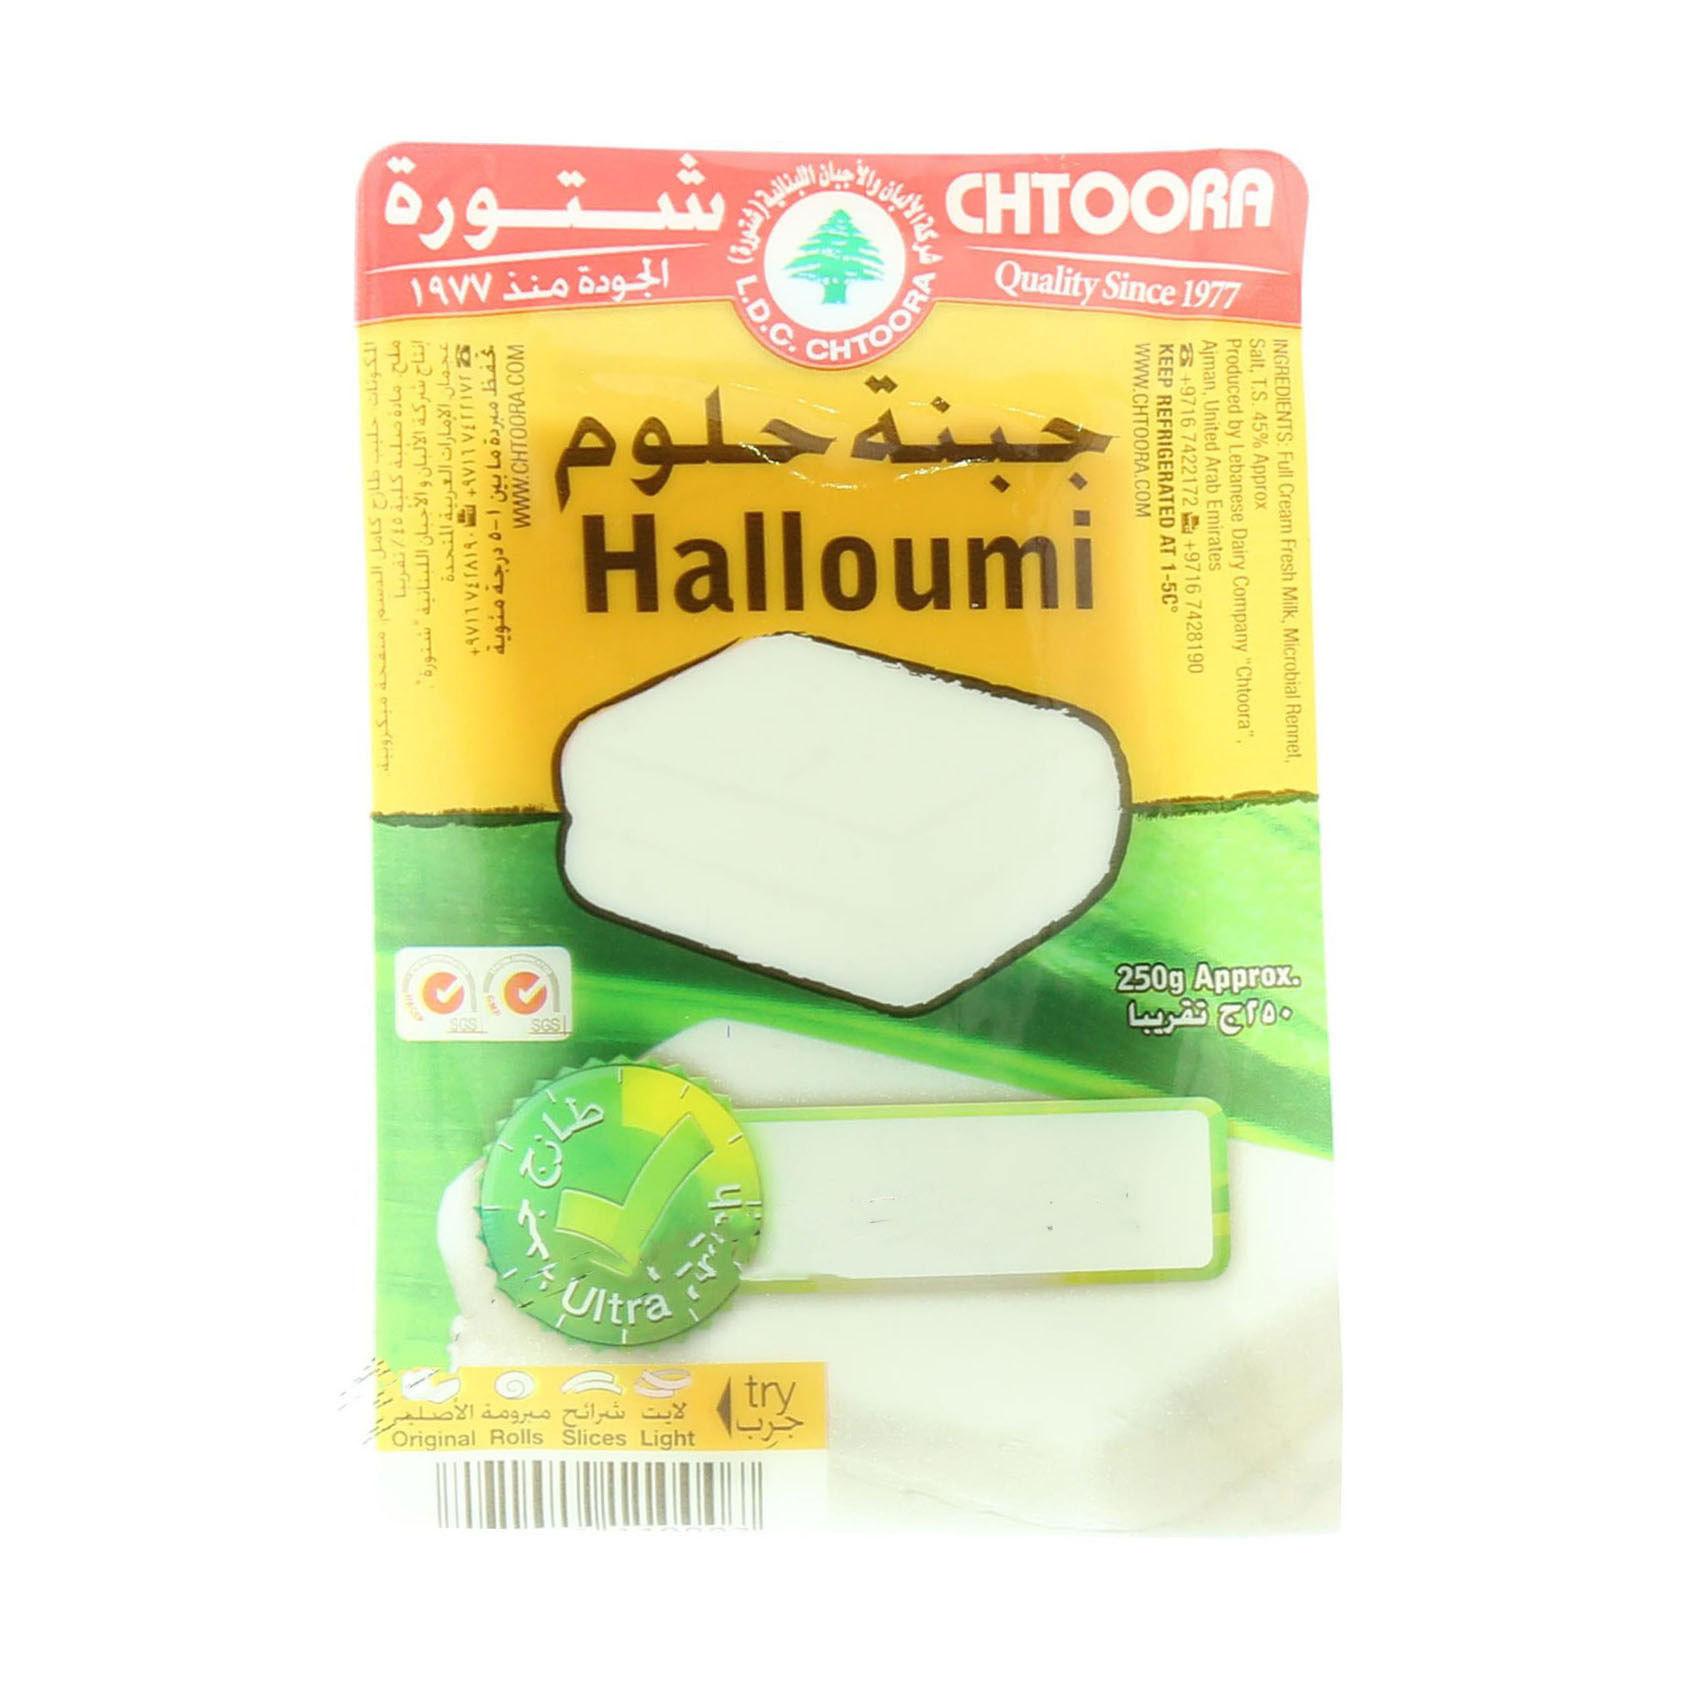 CHTOORA FRESH HALLOUMI 250G